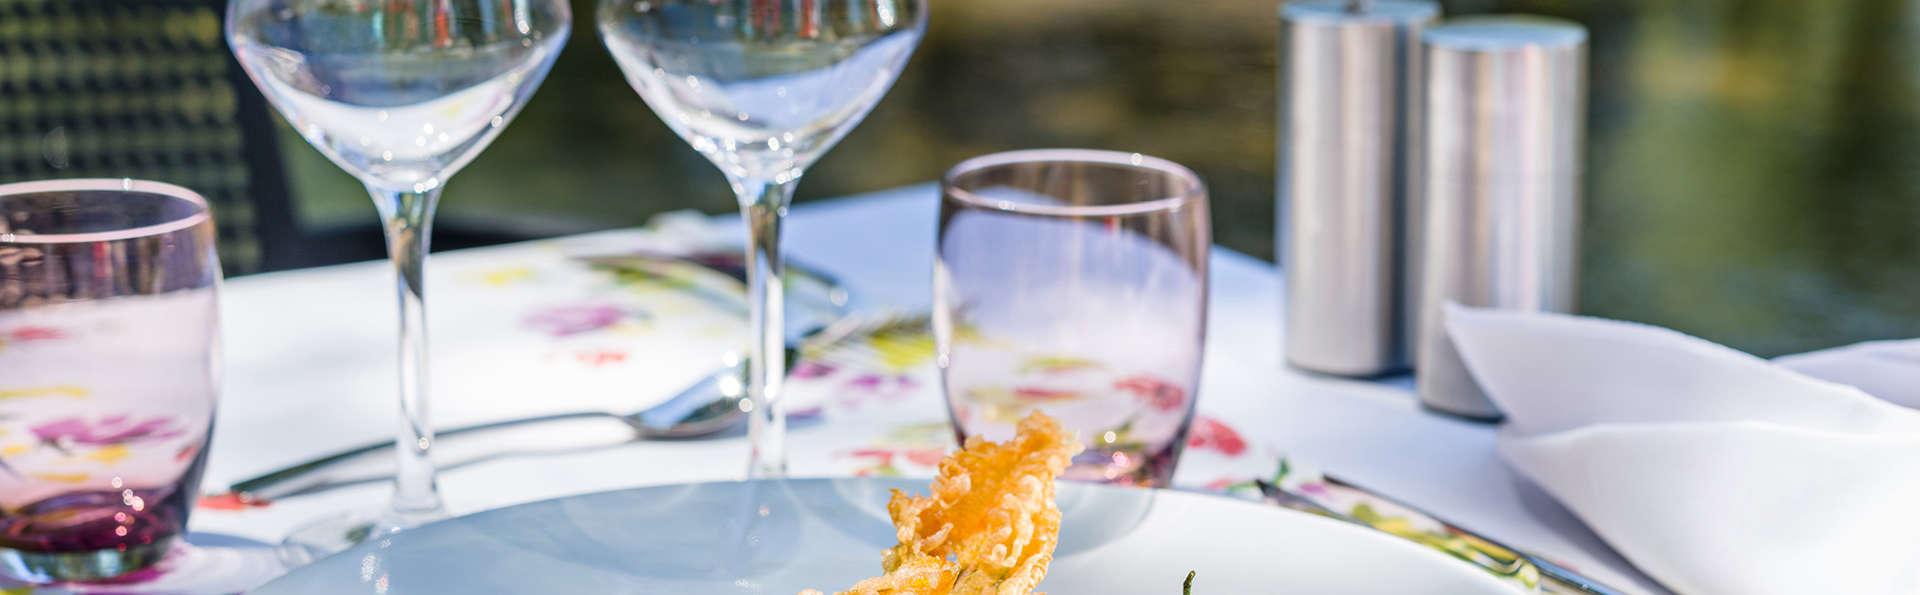 Week-end avec dîner dans le Luberon